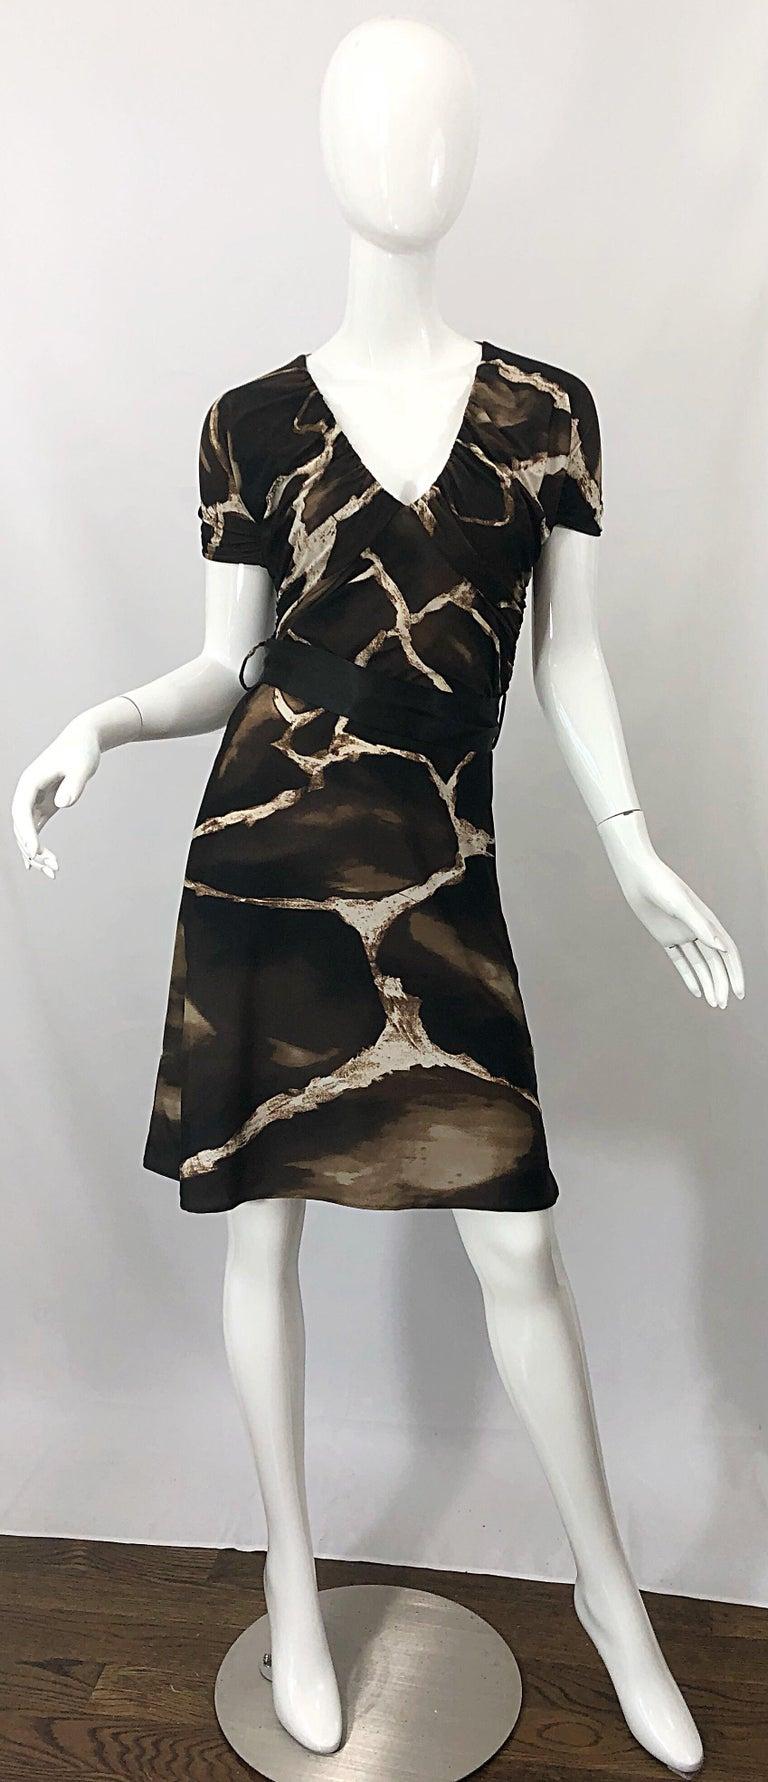 1980s Roberto Cavalli for Neiman Marcus Giraffe Print Vintage 80s Jersey Dress For Sale 9